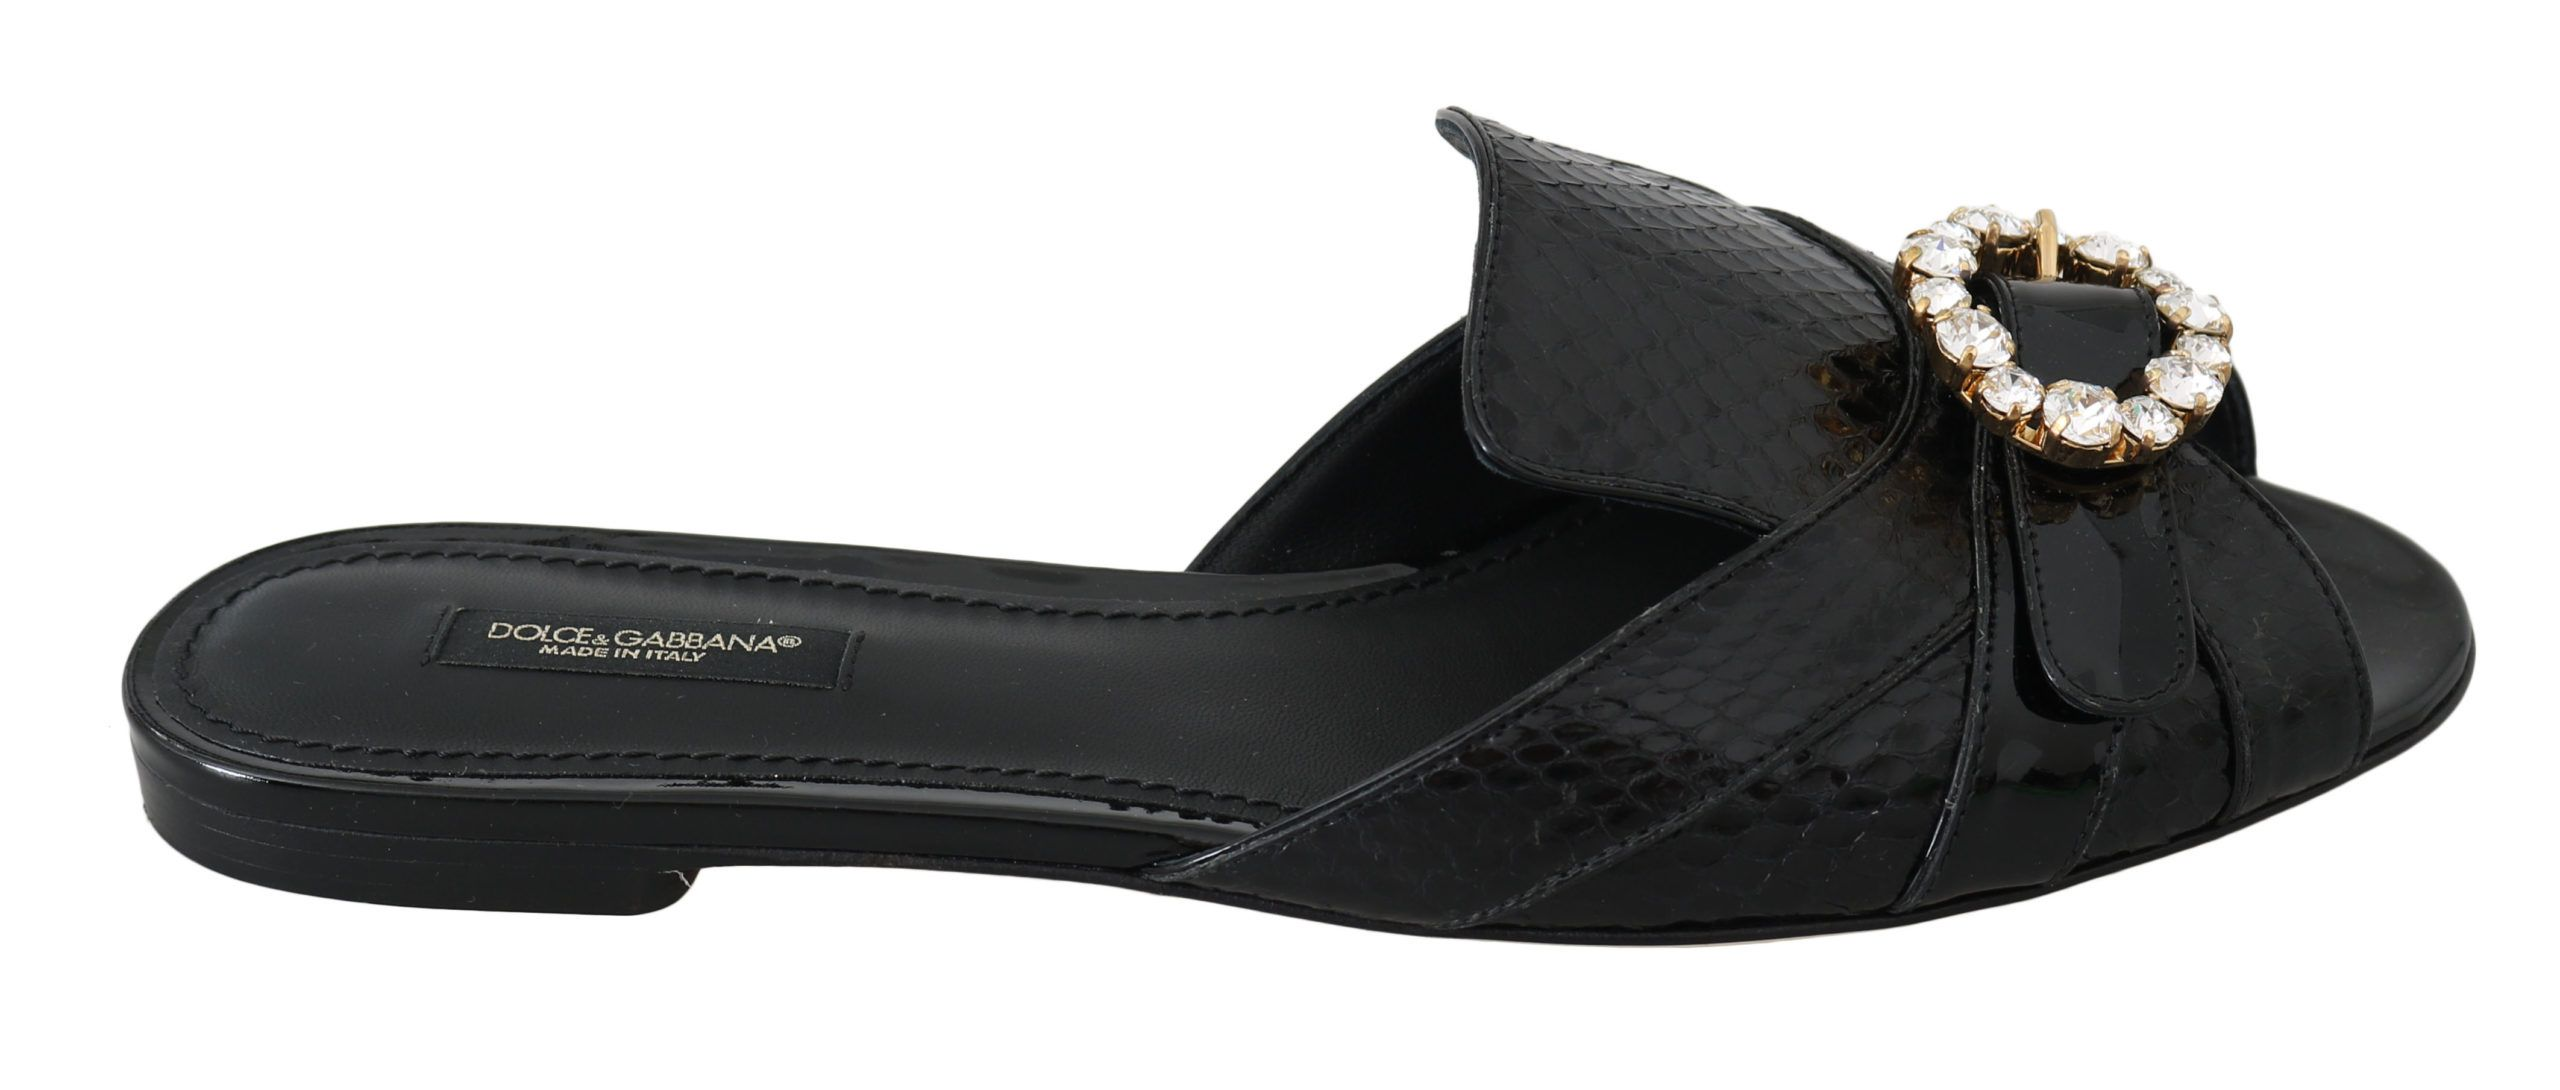 Dolce & Gabbana Black Ayers Leather Flats Slides Shoes